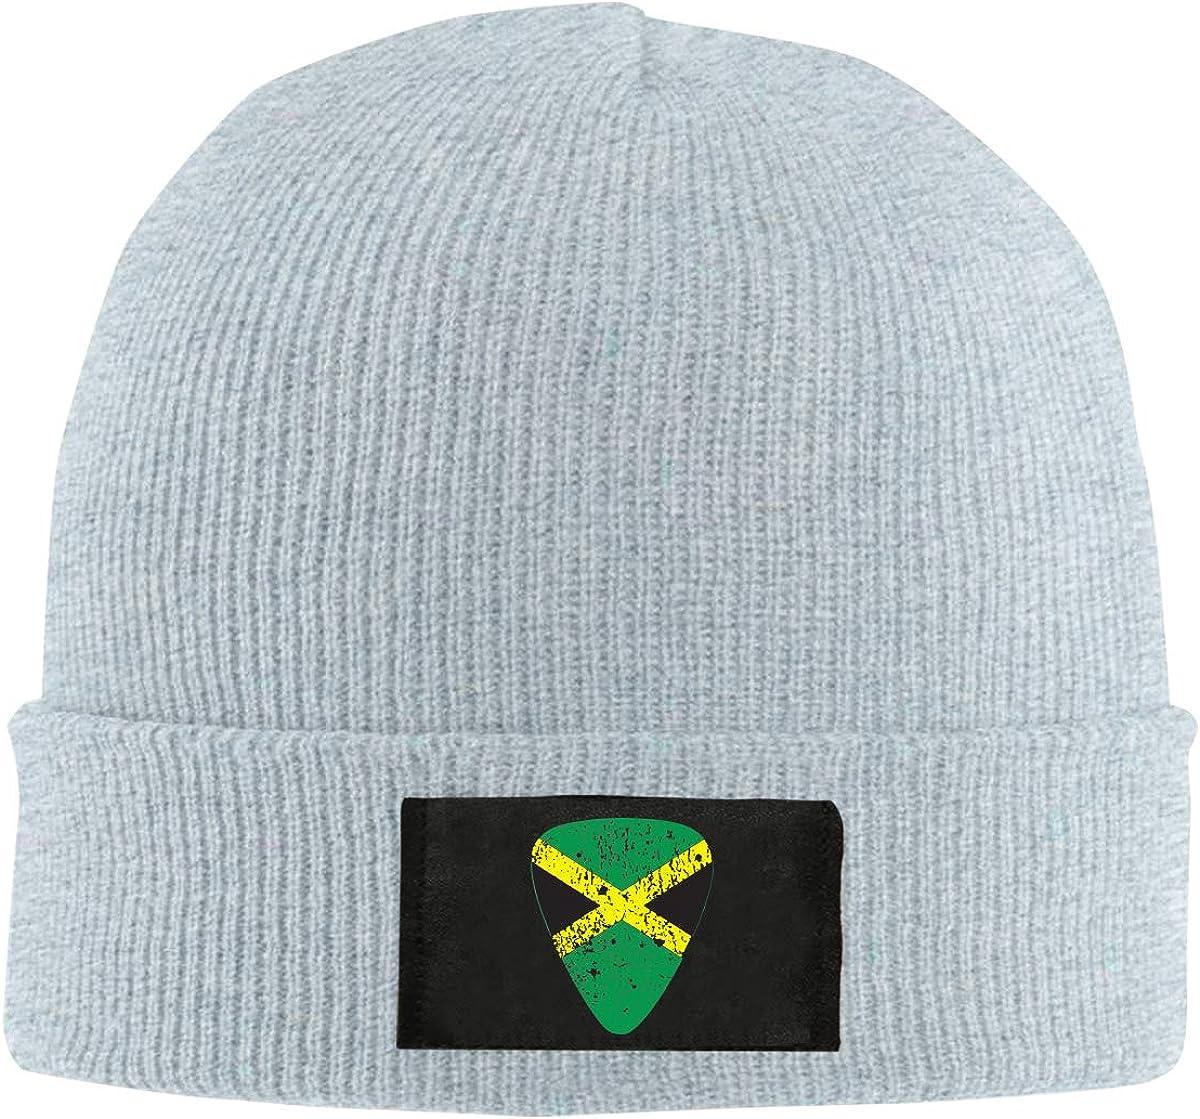 Jamaican Flag Picks Men Women Knitted Hat Winter Warm Snowboarding Hat